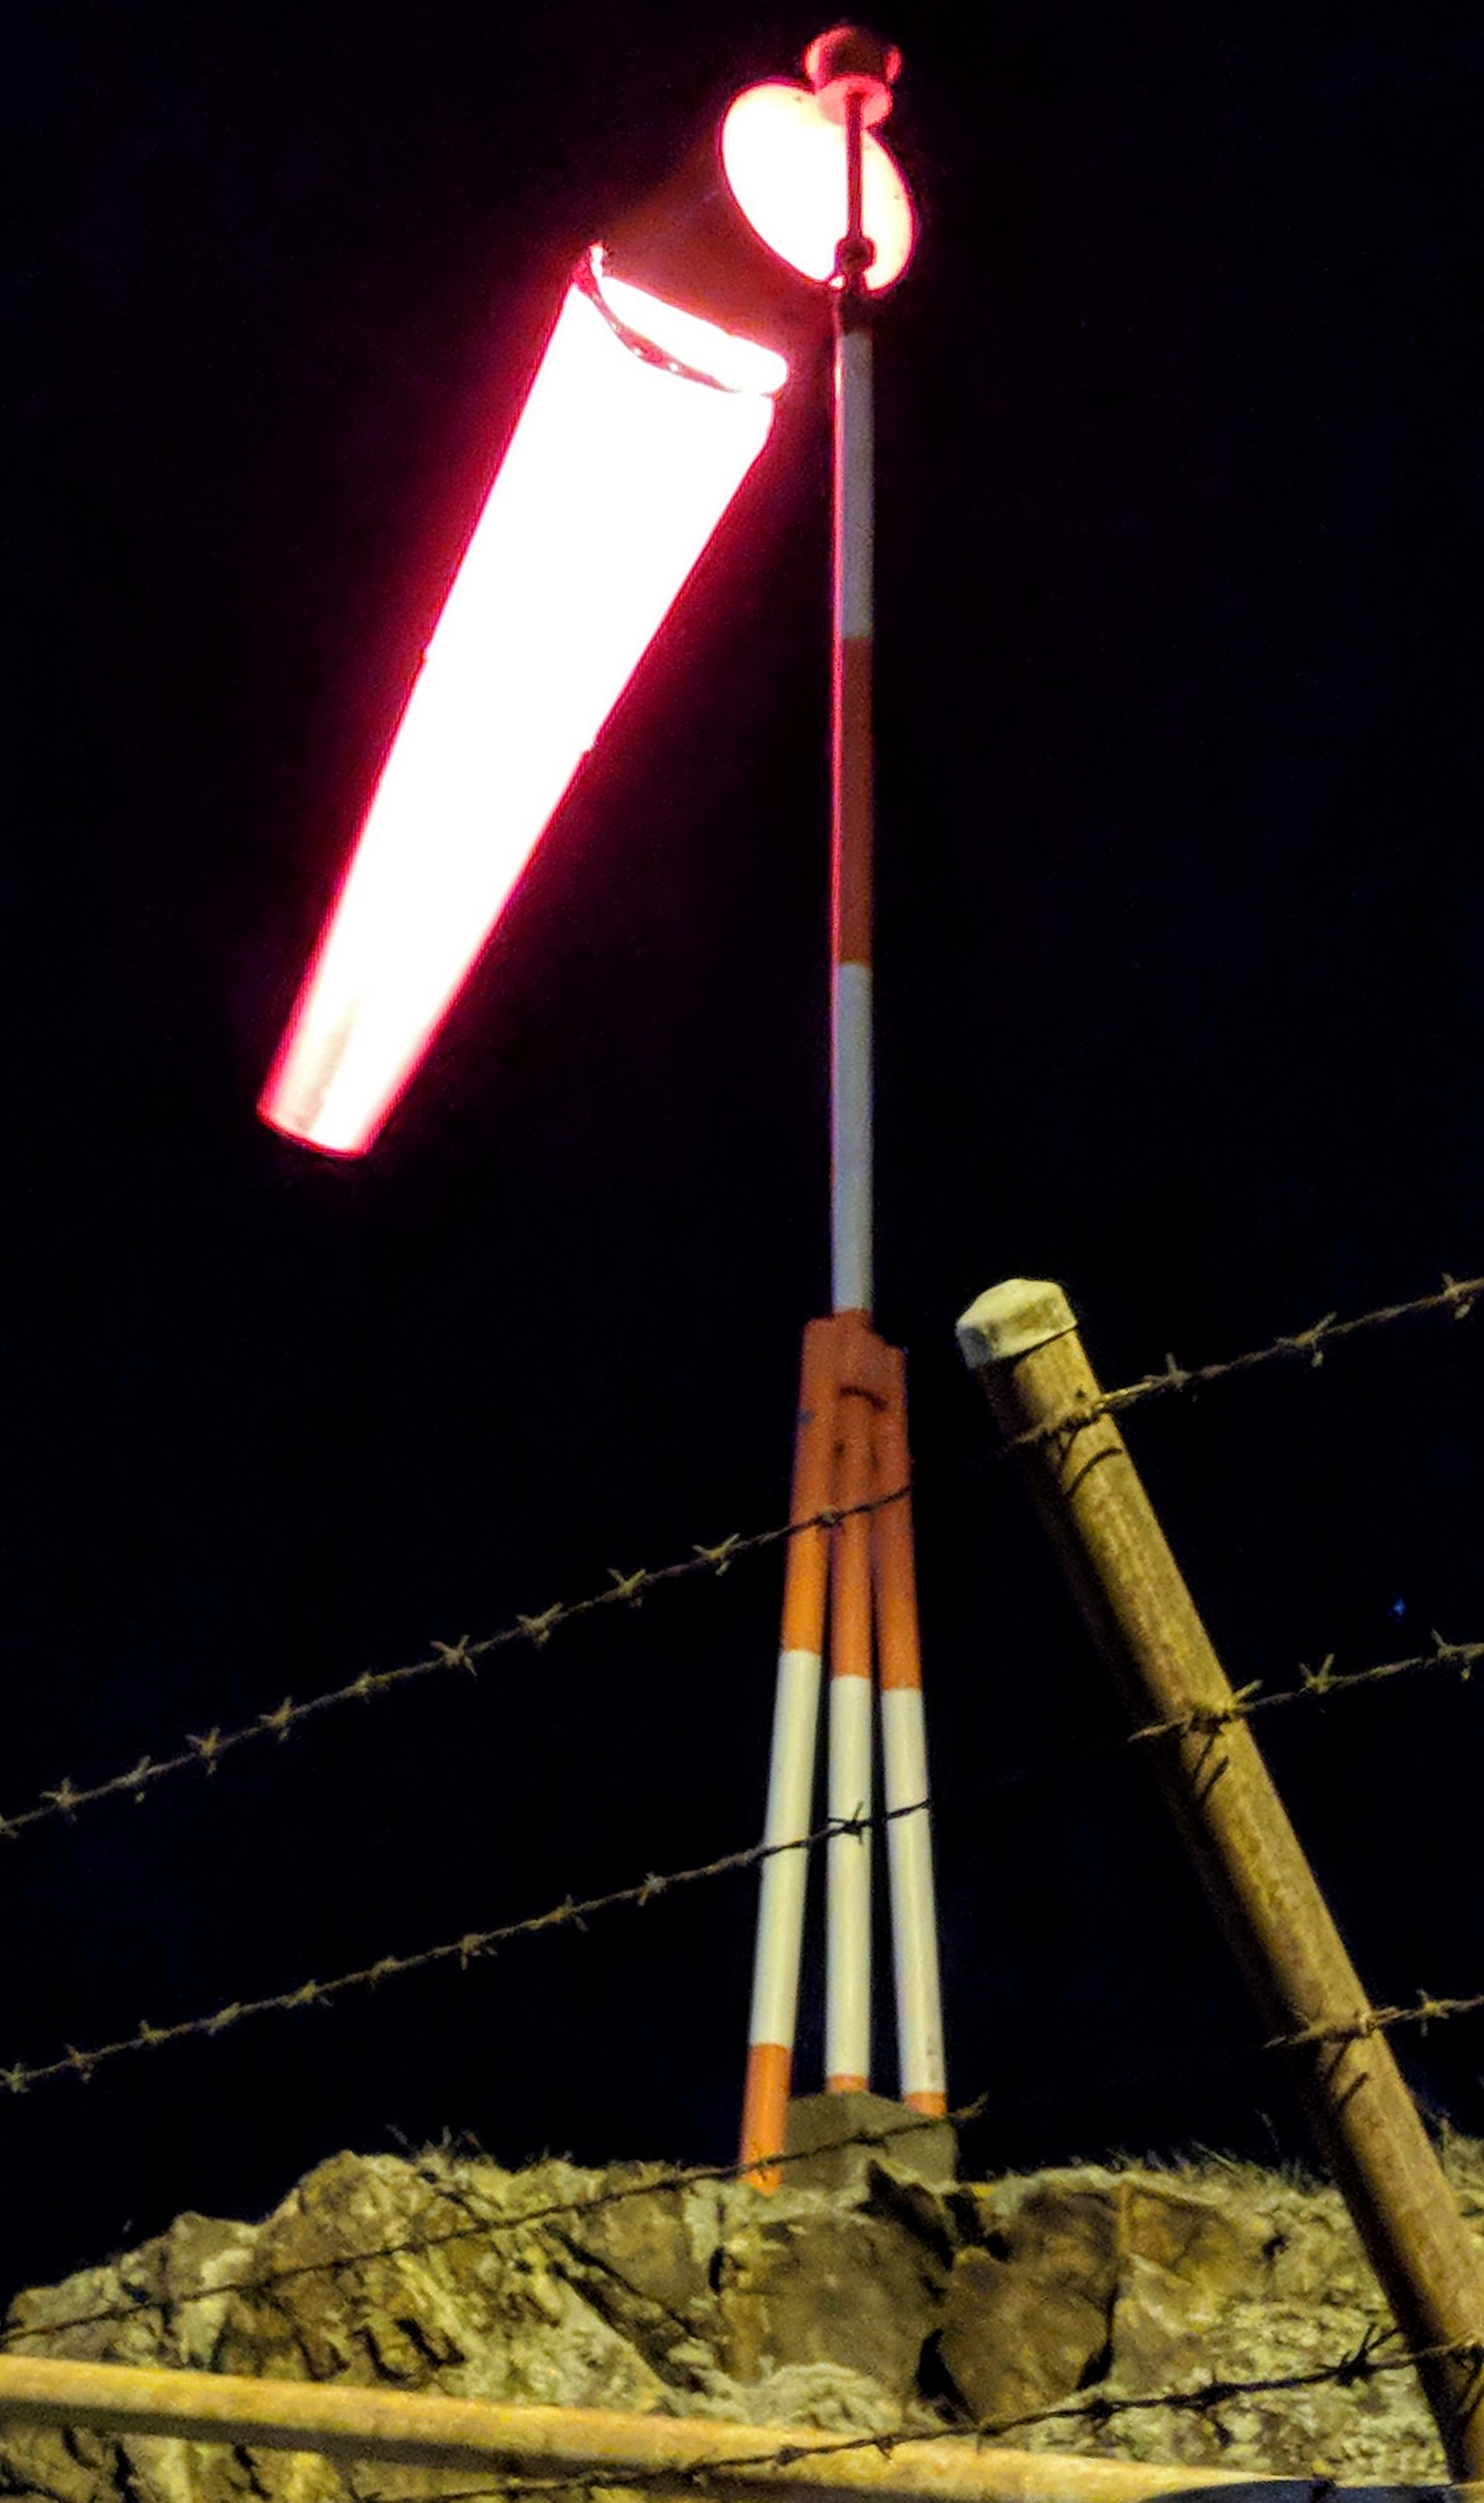 Illuminated wind sock